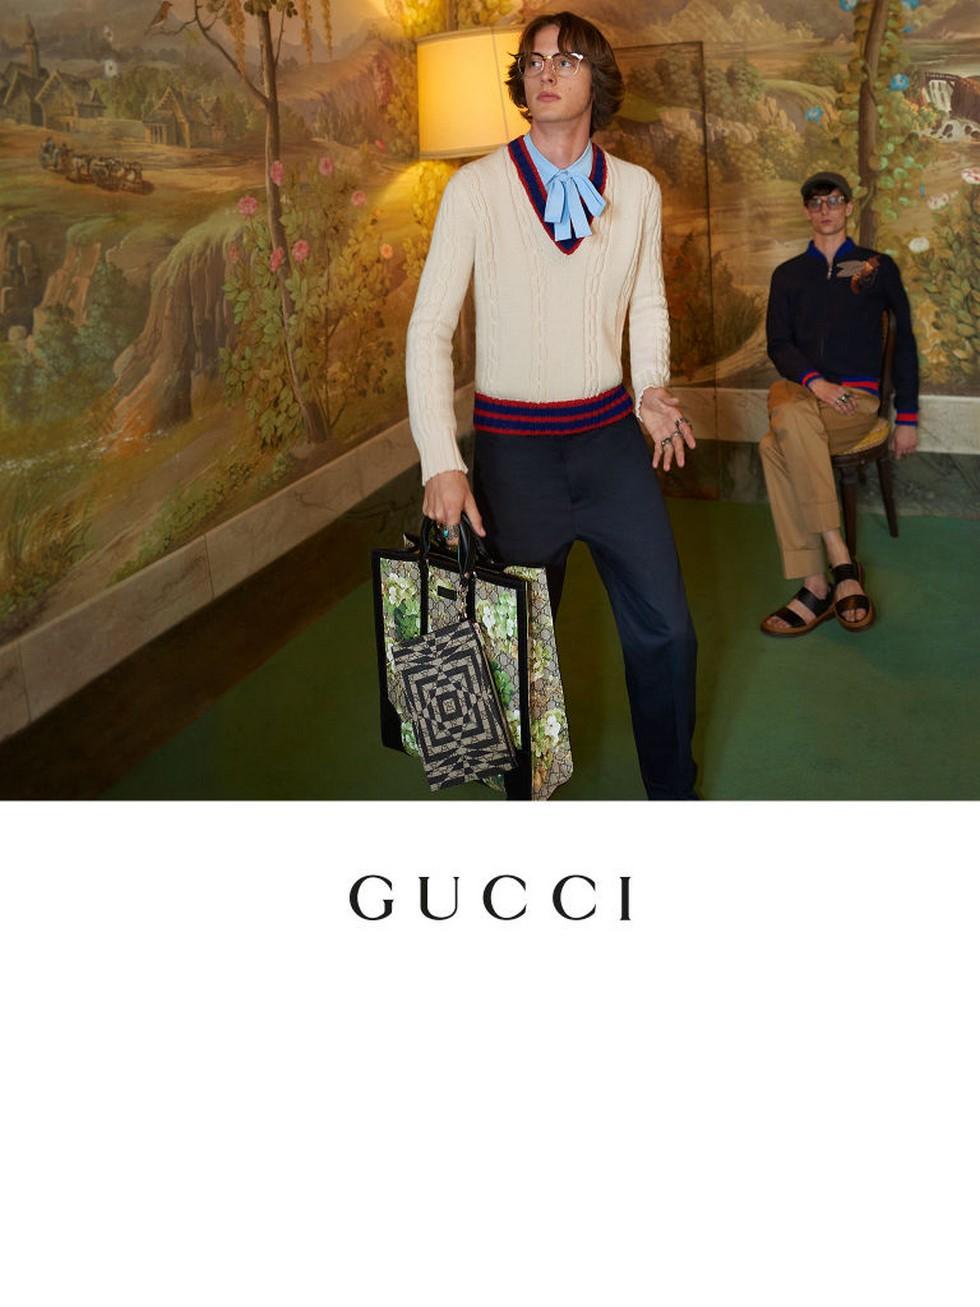 Milan Fashion Boutiques Gucci unveils new store concept (4) Milan Fashion Boutiques: Gucci unveils new store concept Milan Fashion Boutiques: Gucci unveils new store concept Milan Fashion Boutiques Gucci unveils new store concept 4